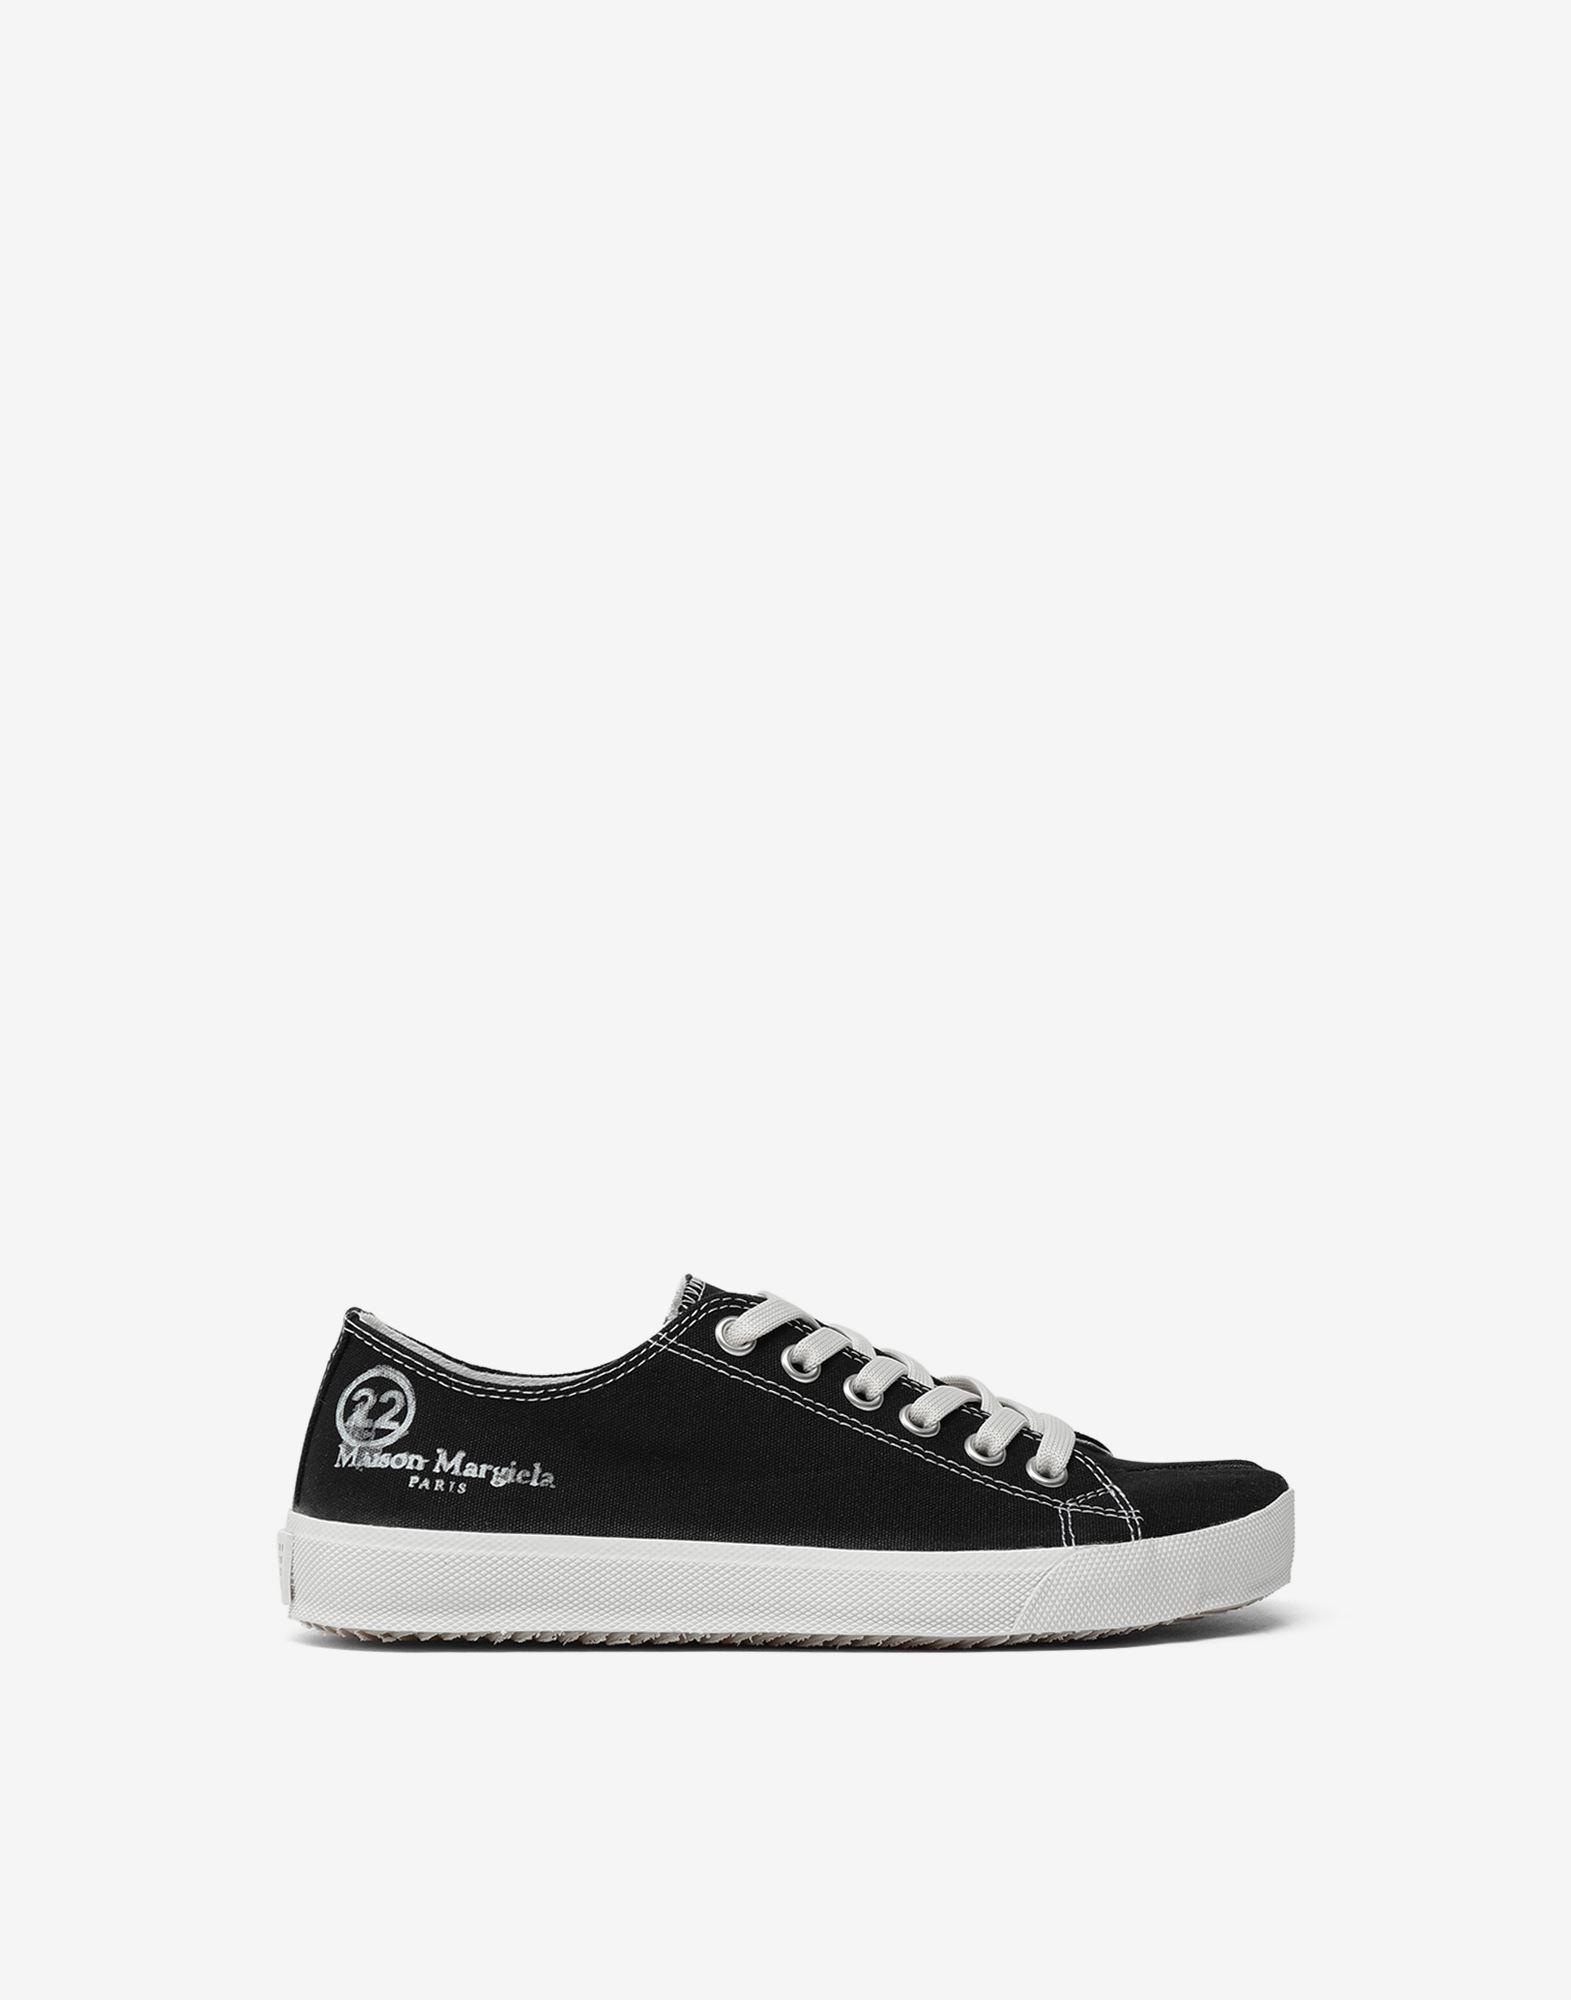 MAISON MARGIELA Tabi low top canvas sneakers Sneakers Tabi Woman f